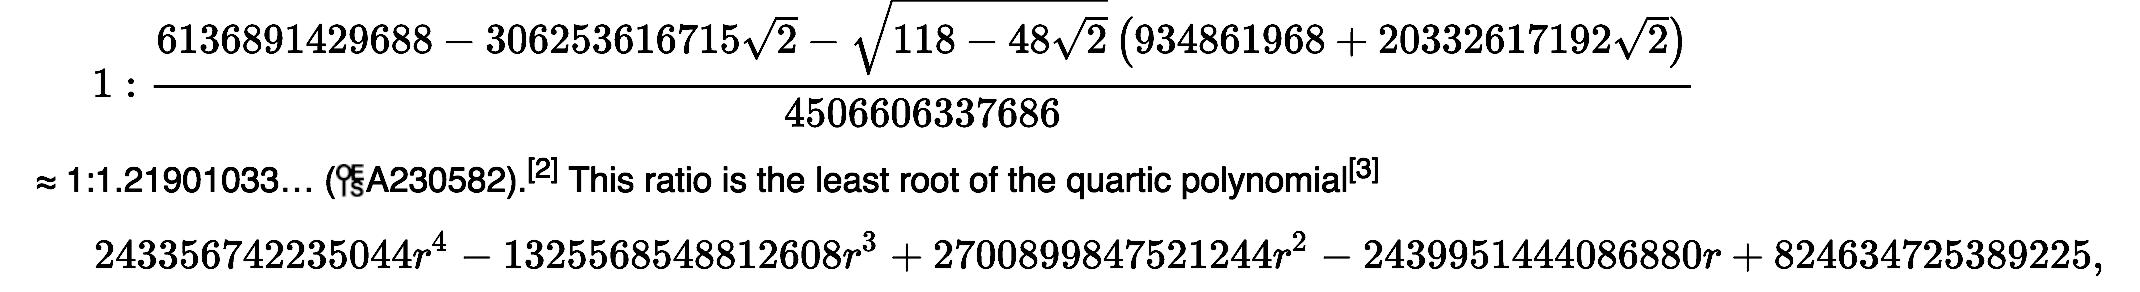 nepal-flag-formula